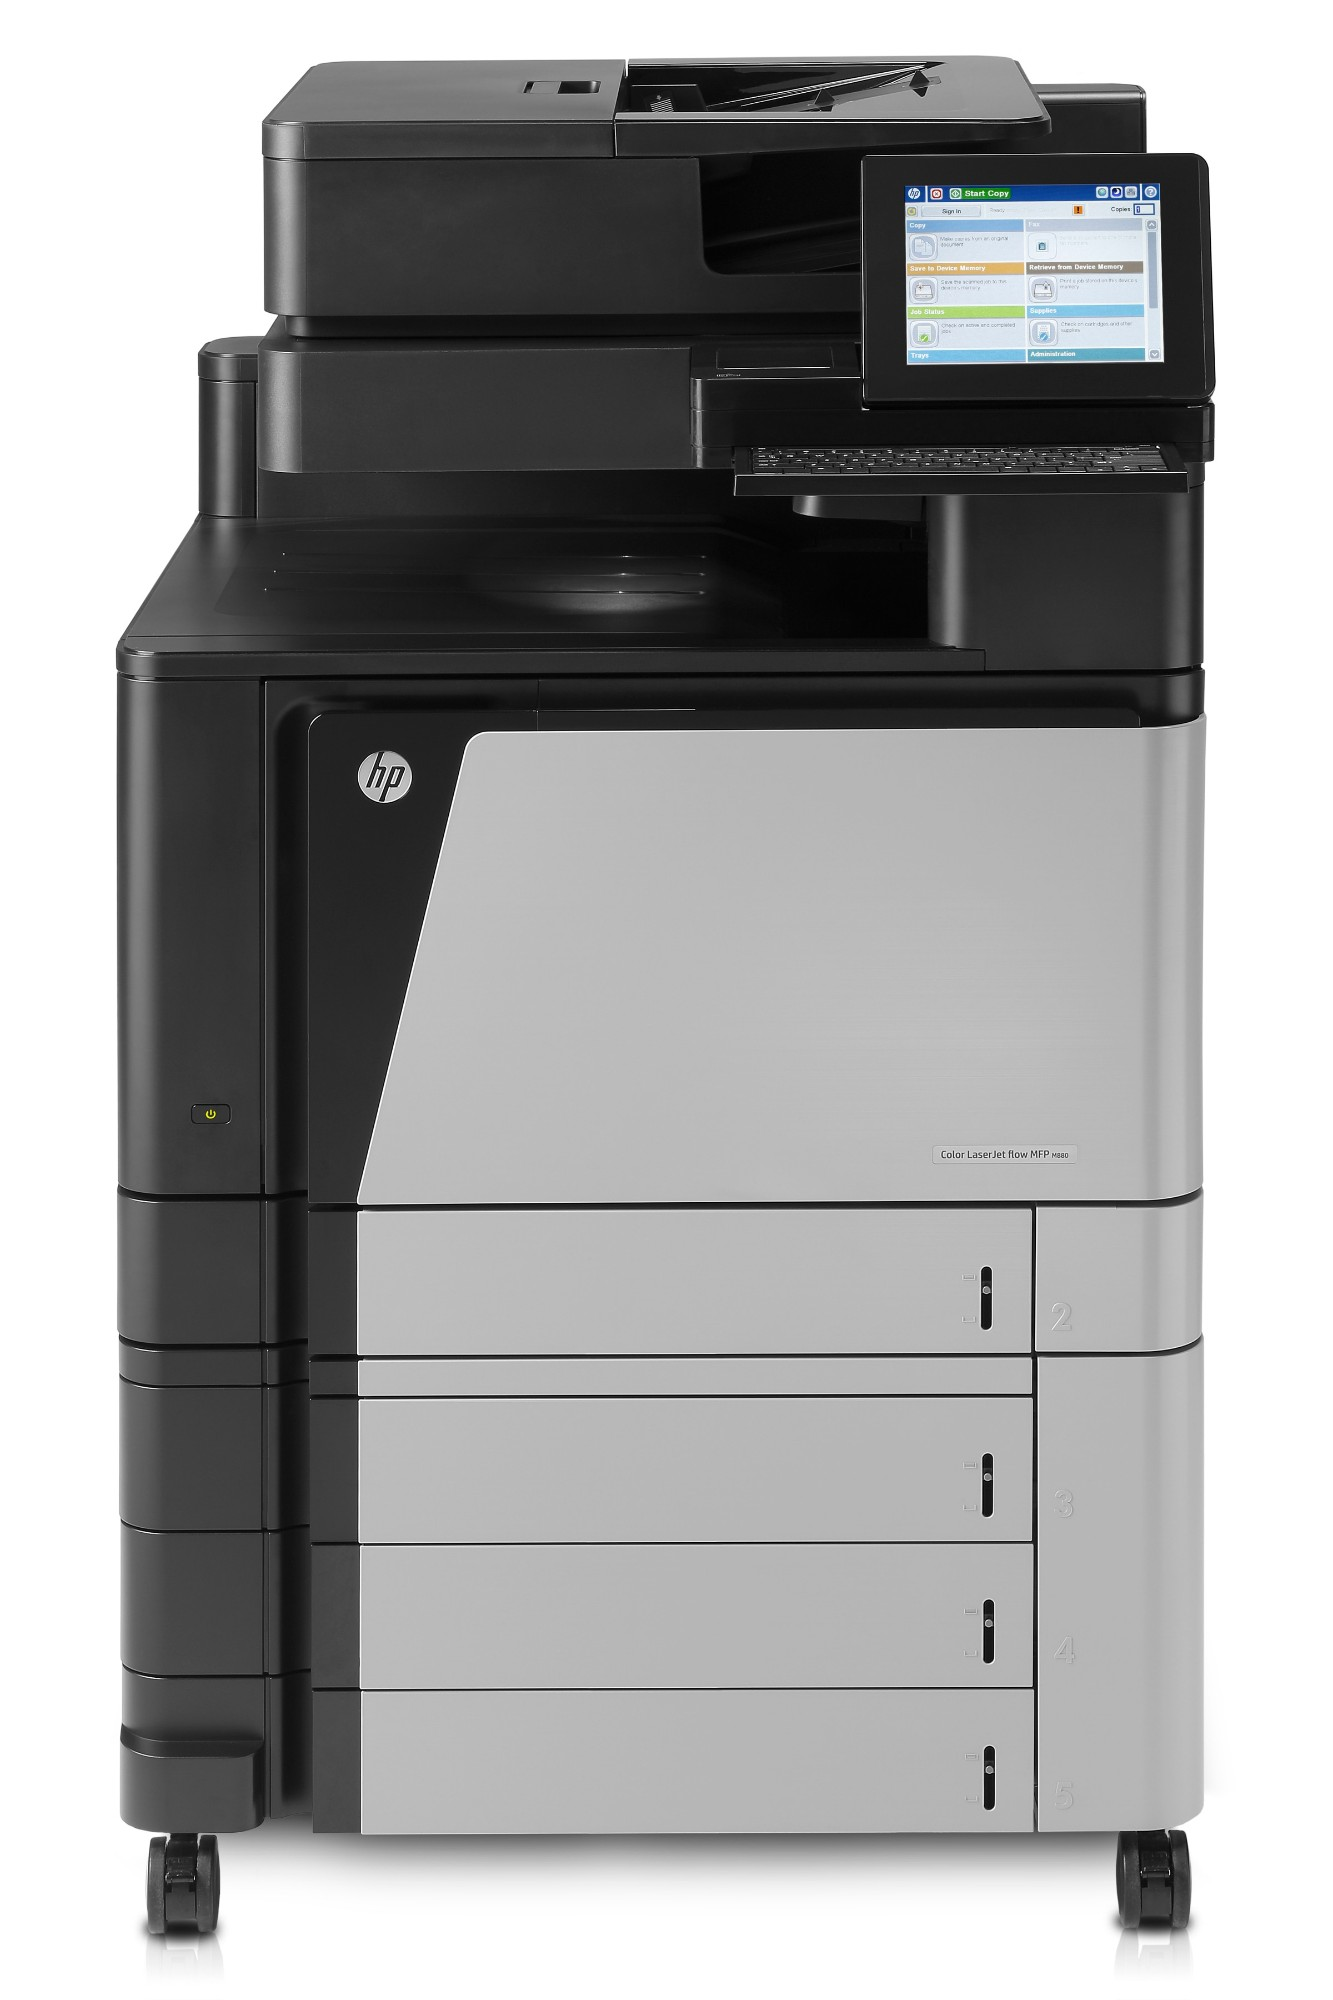 HP Color LaserJet Enterprise Flow M880z Laser A3 1200 x 1200 DPI 46 ppm